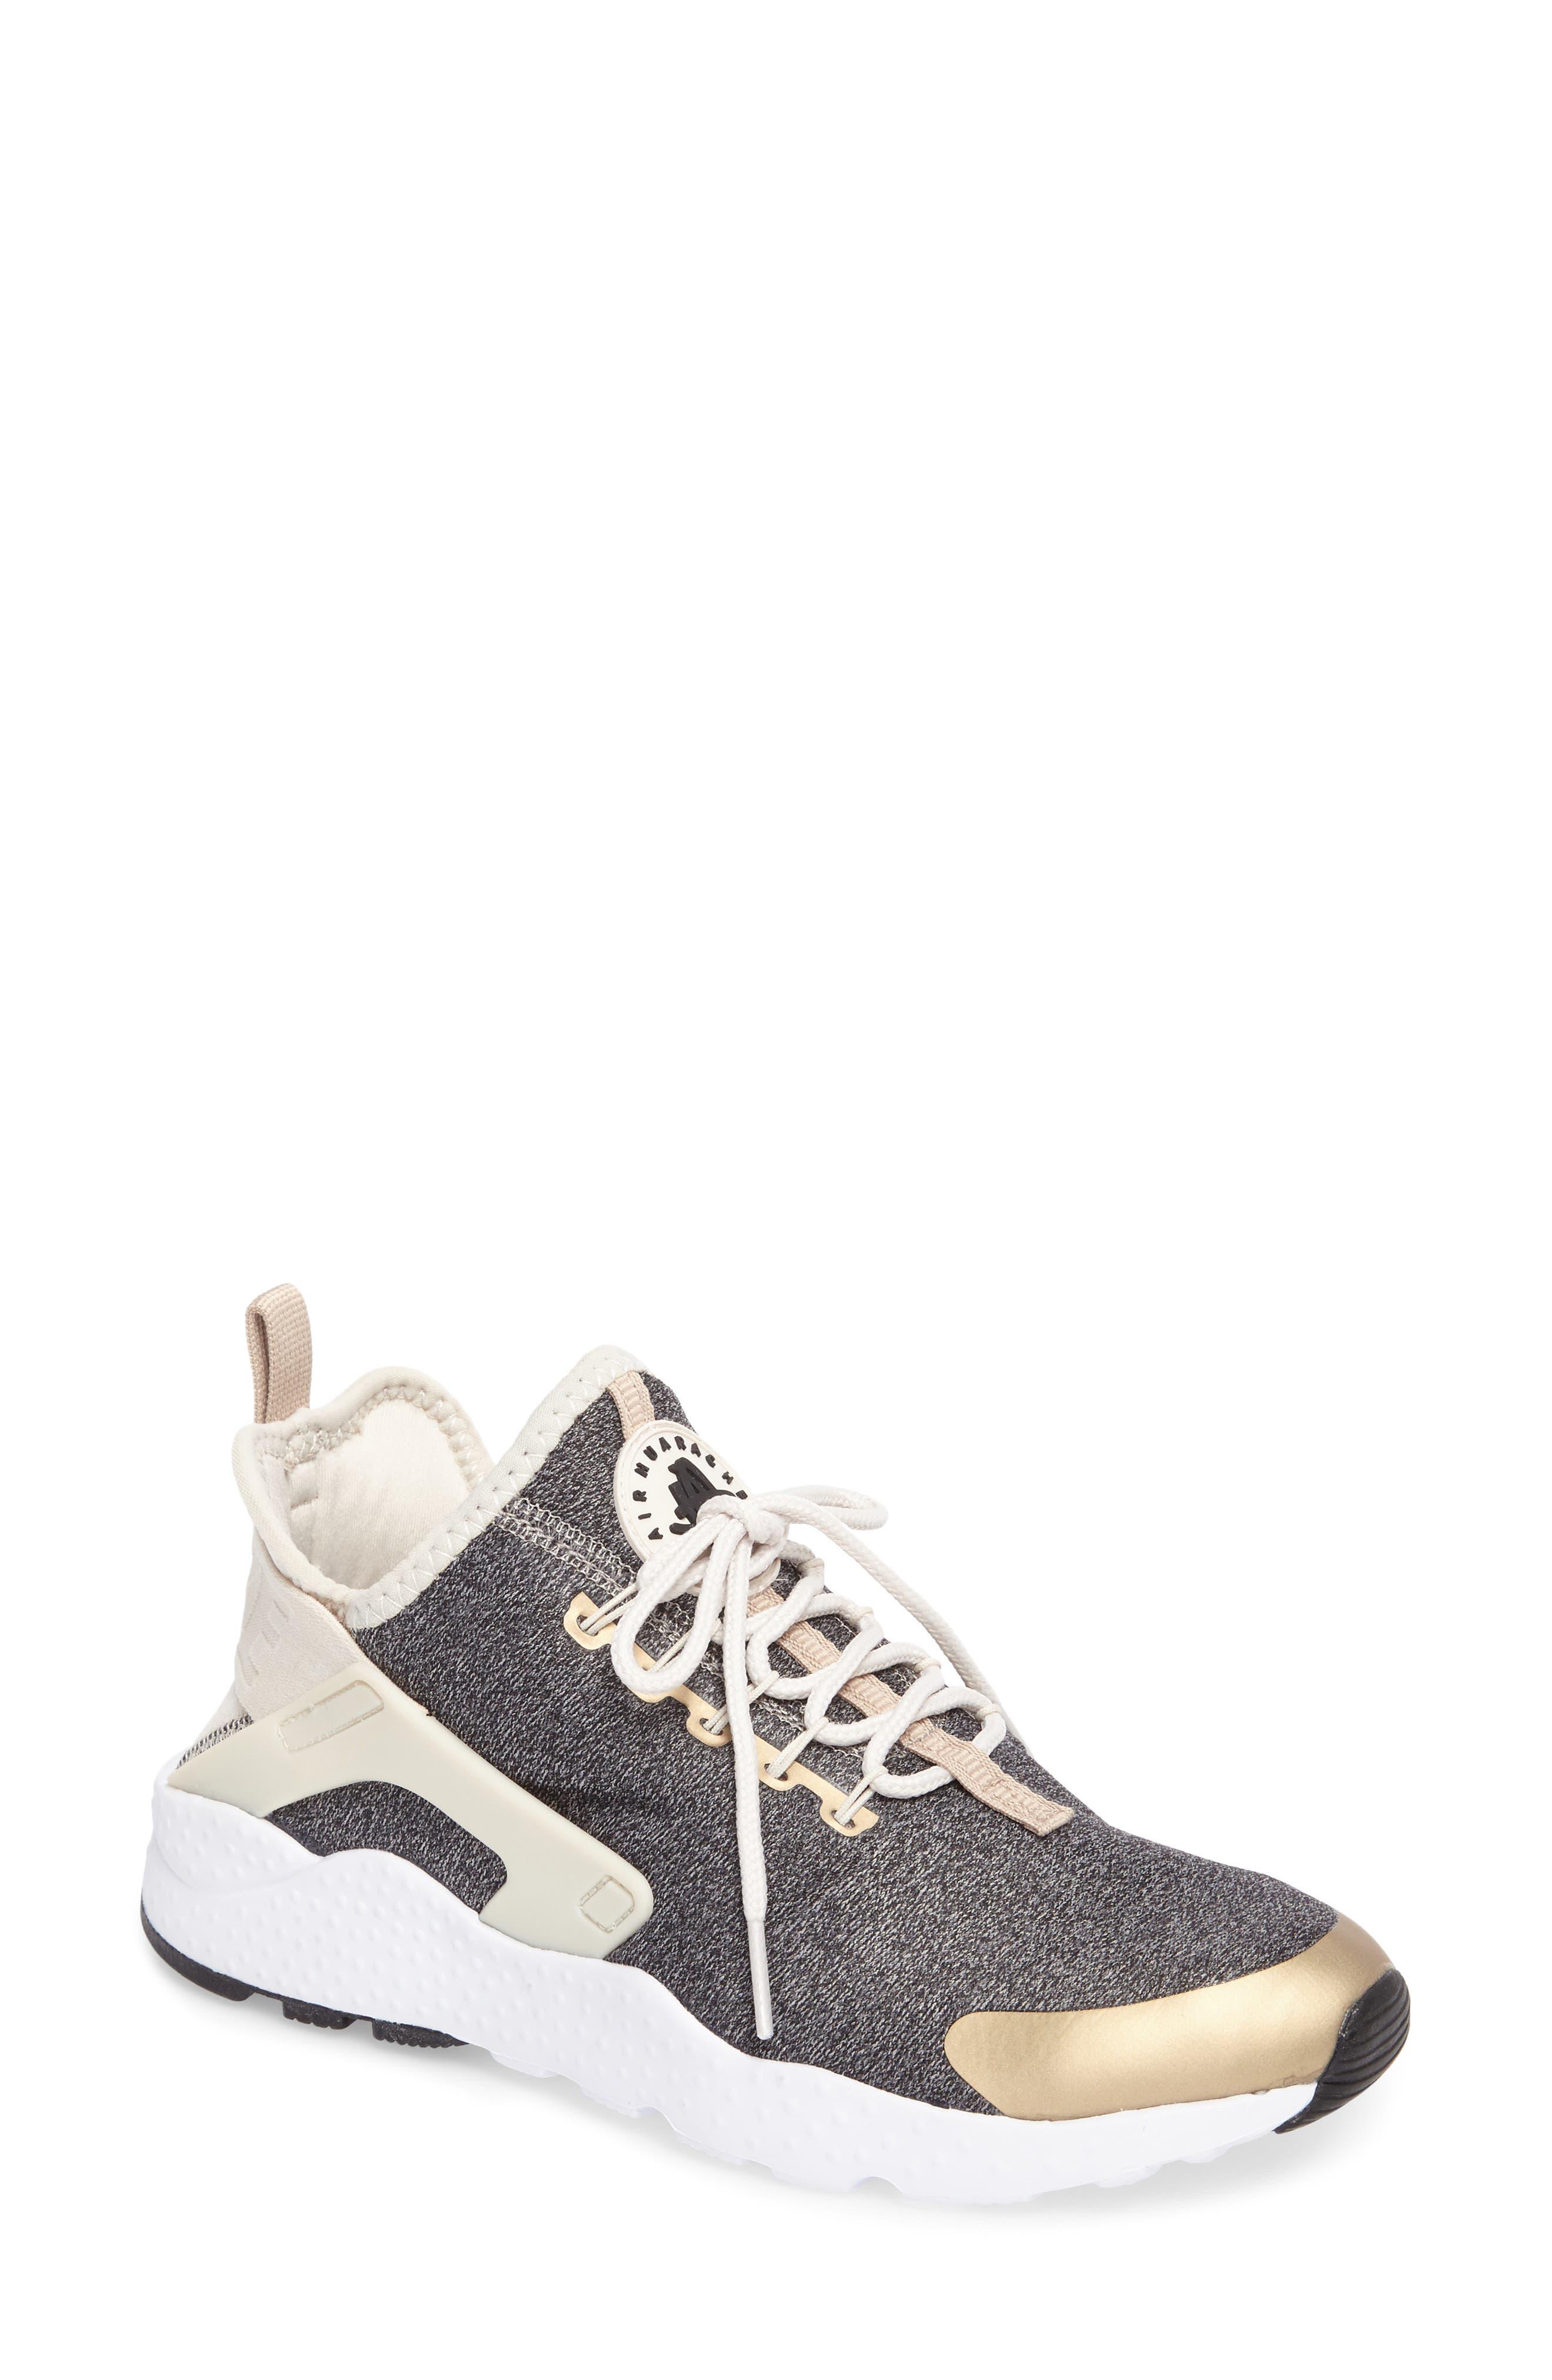 'Air Huarache Run Ultra SE' Sneaker,                             Main thumbnail 1, color,                             285